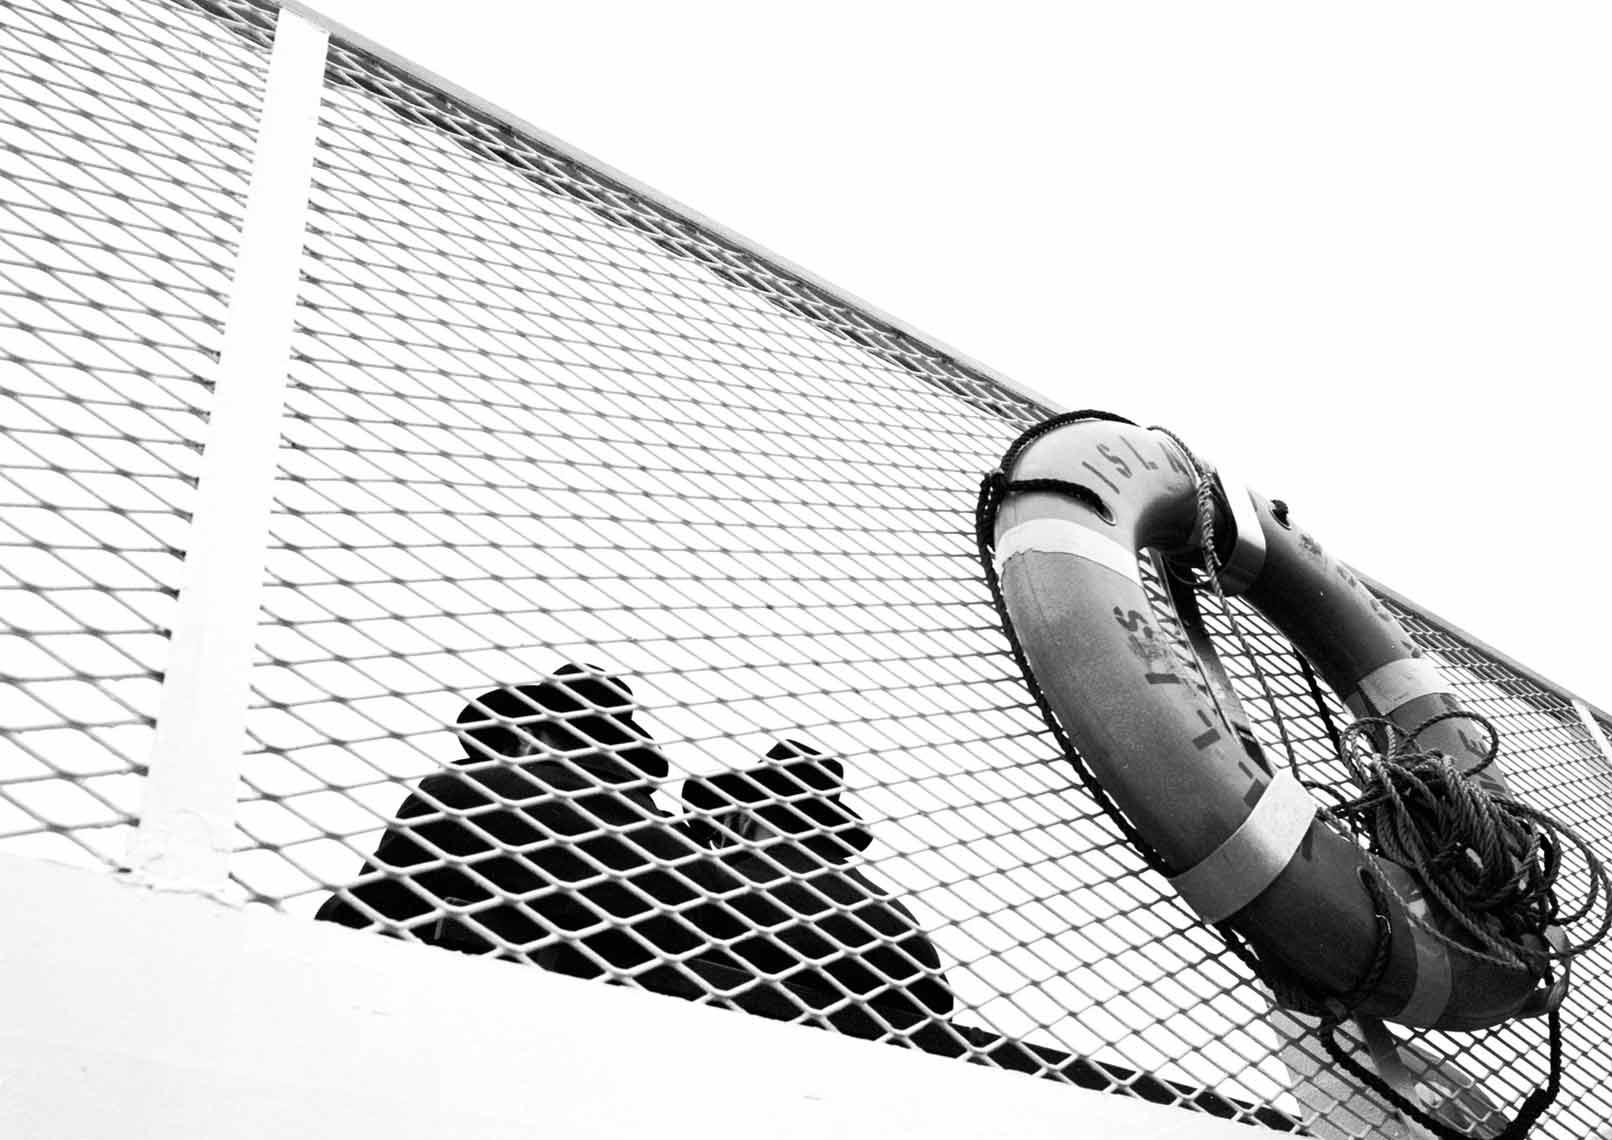 fotografie-rotterdam-fotograaf-pim-vuik-new-york-34.jpg